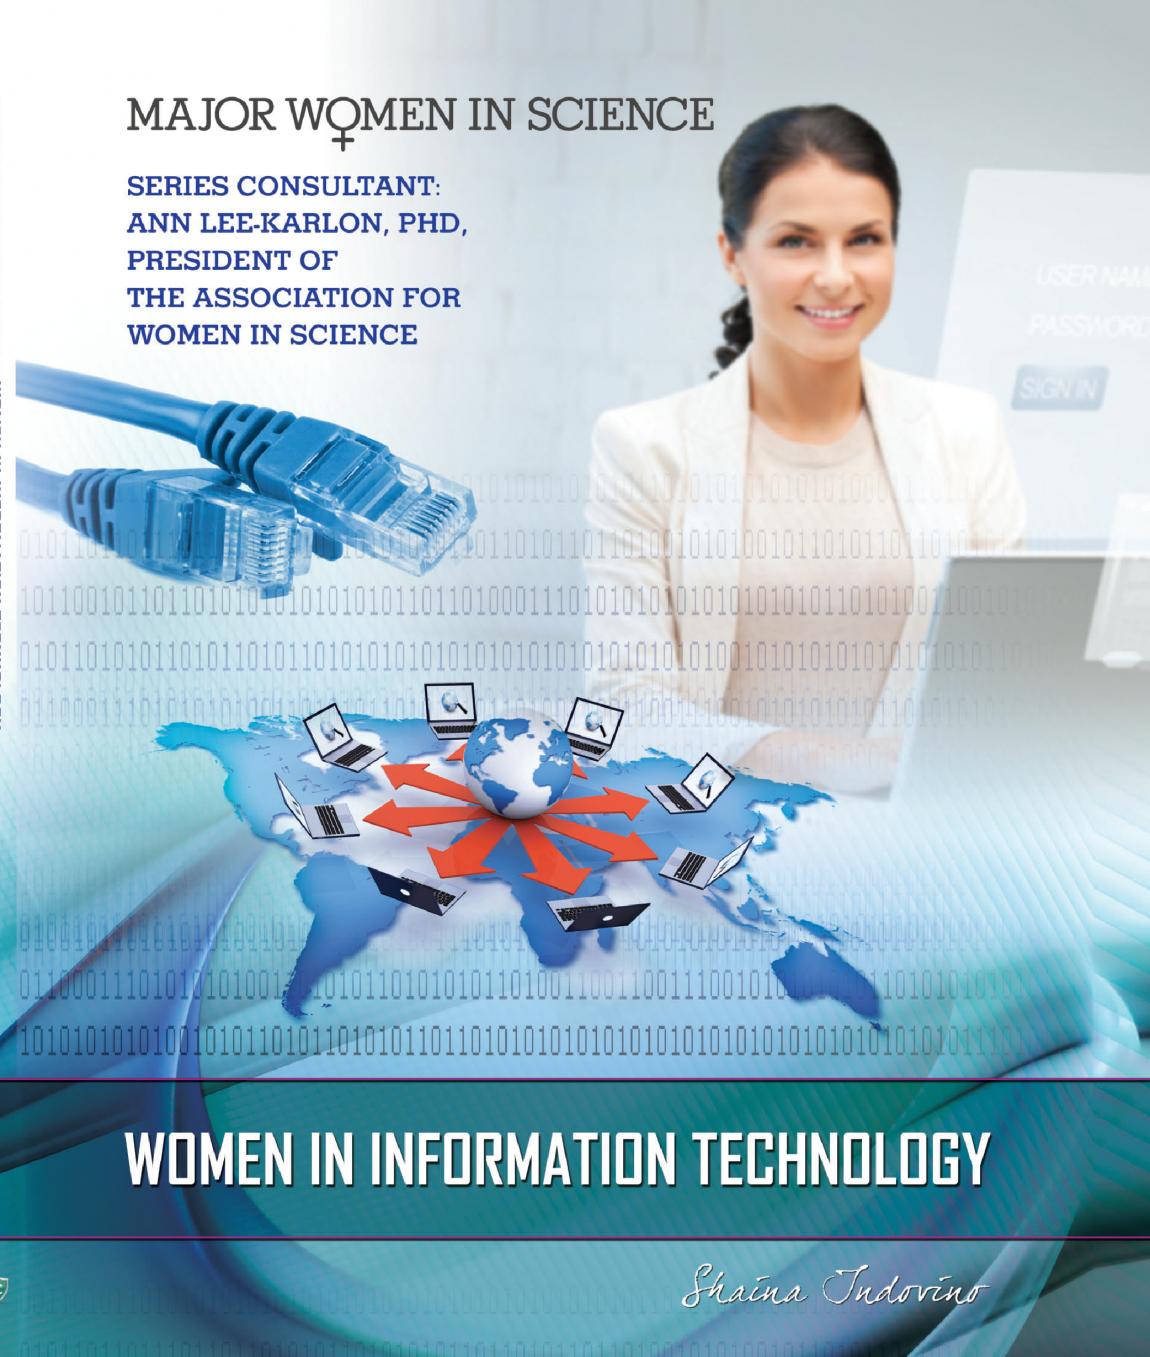 women-in-info-tech-01.png